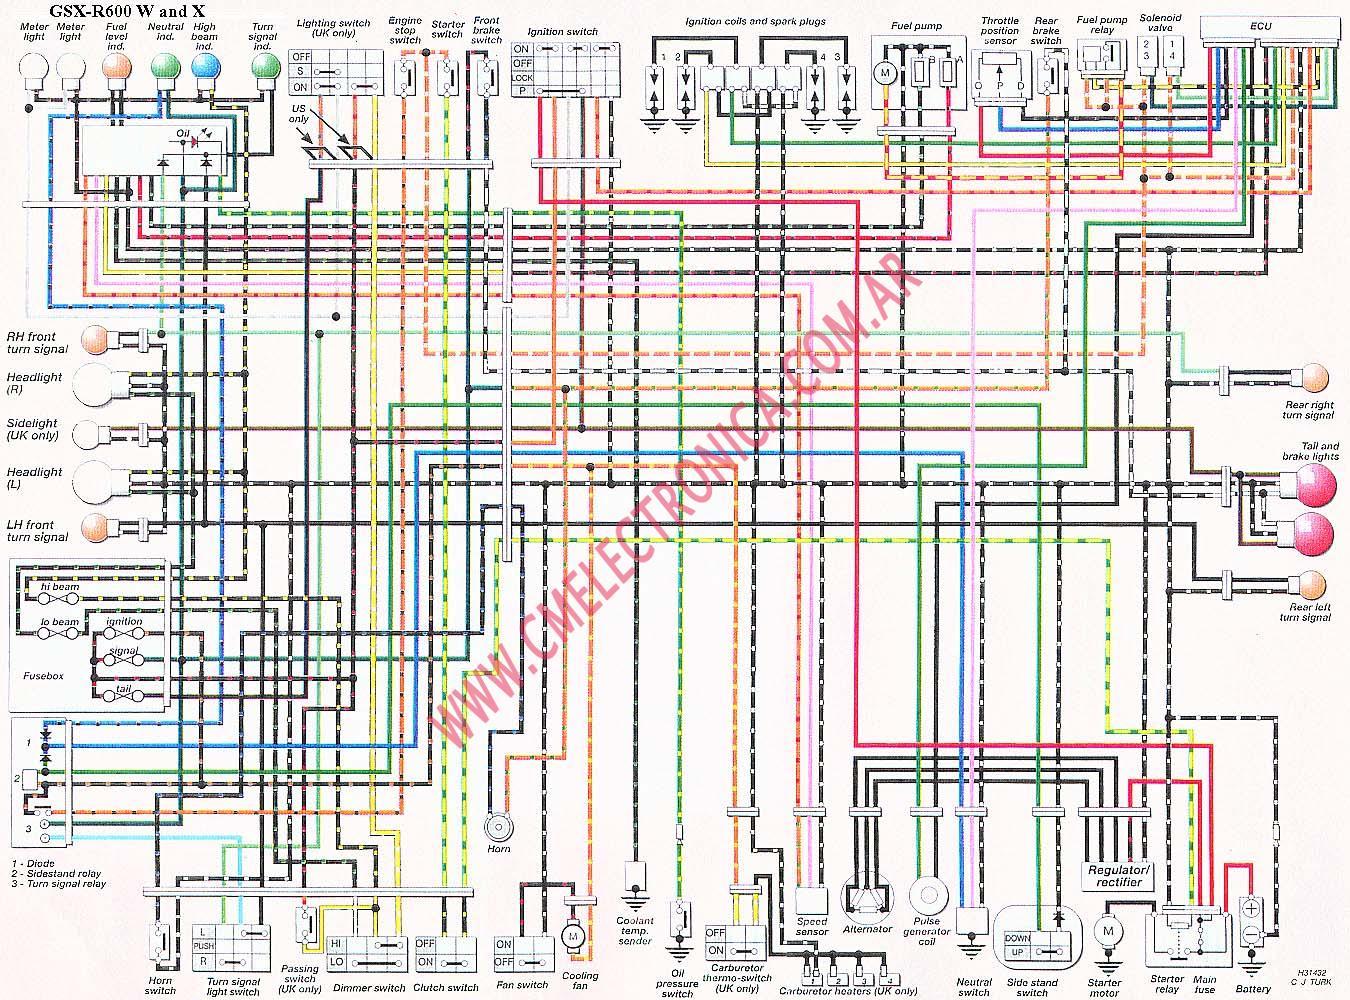 Großzügig Suzuki Atv Schaltpläne Fotos - Schaltplan Serie Circuit ...